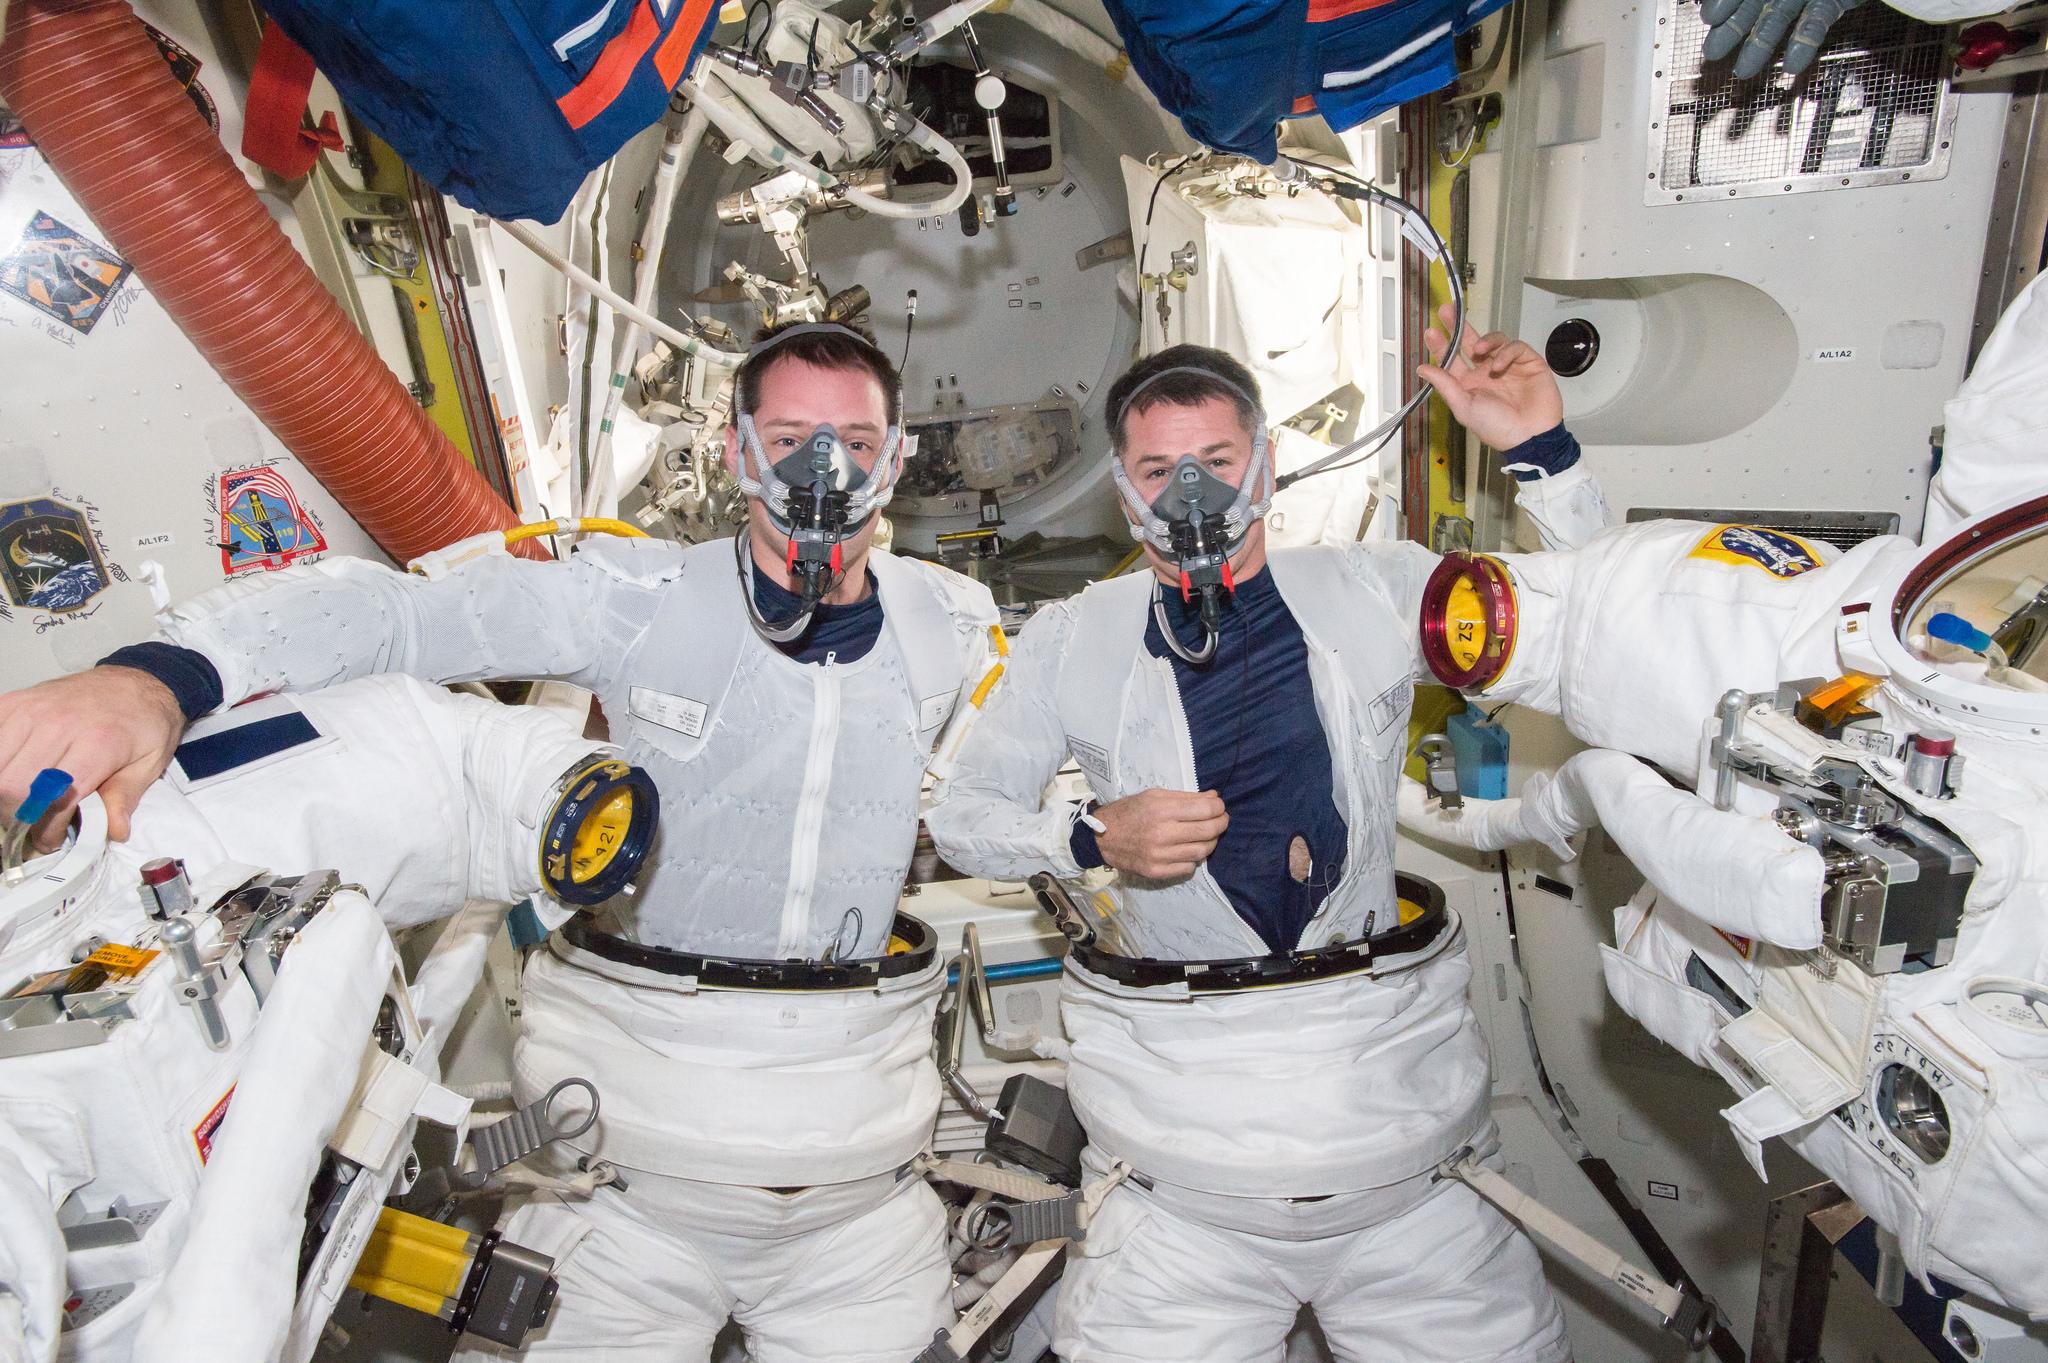 nasa astronauts 2017 - photo #21